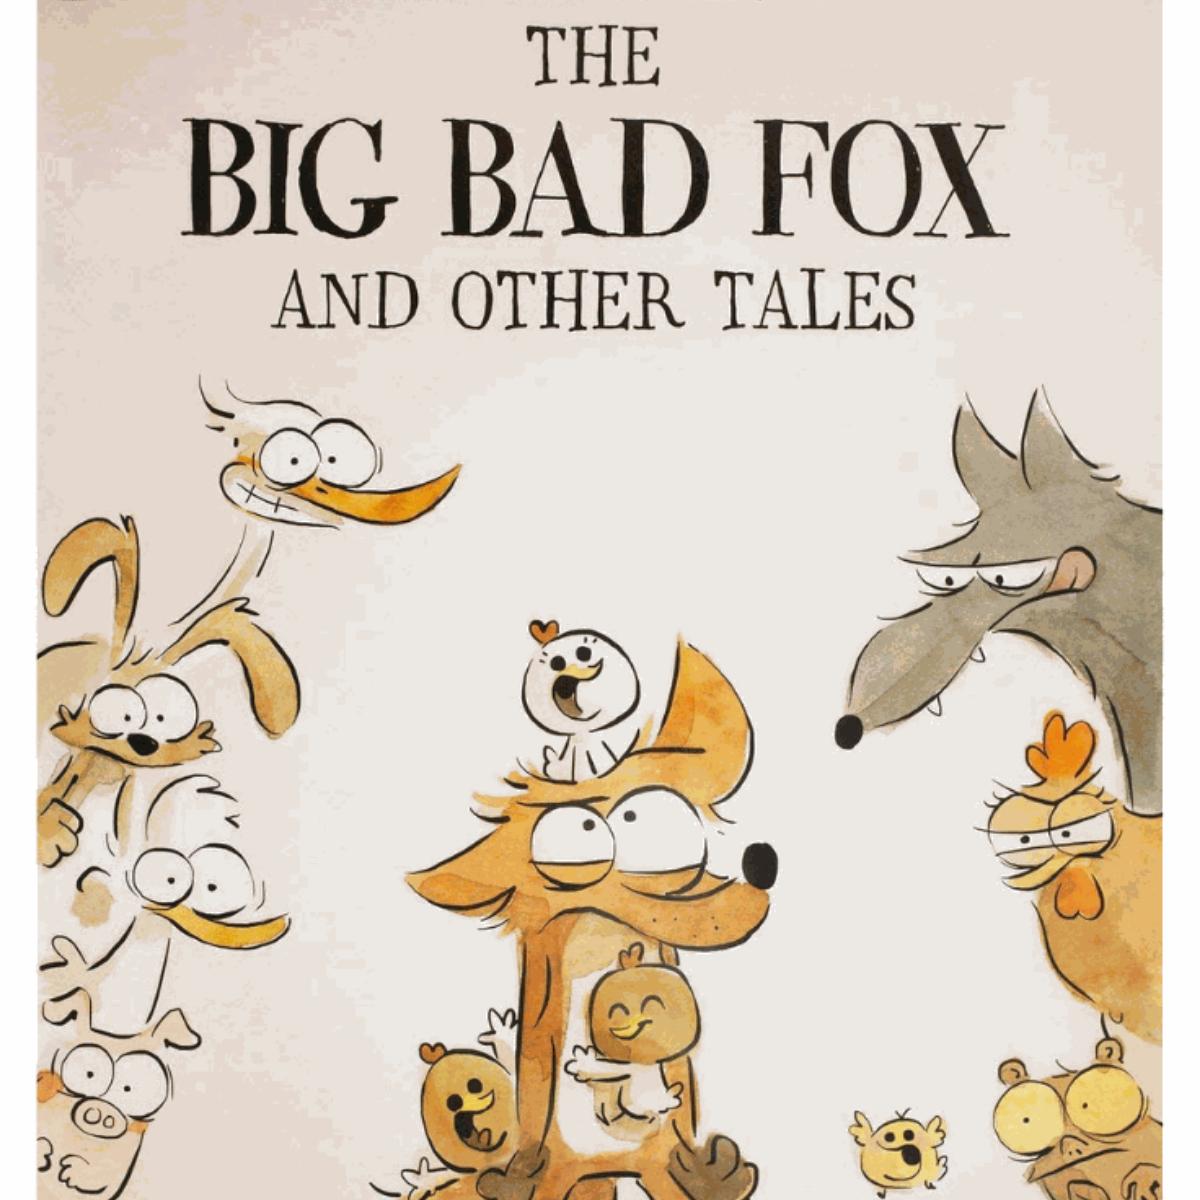 Big Bad Fox Square, No Text